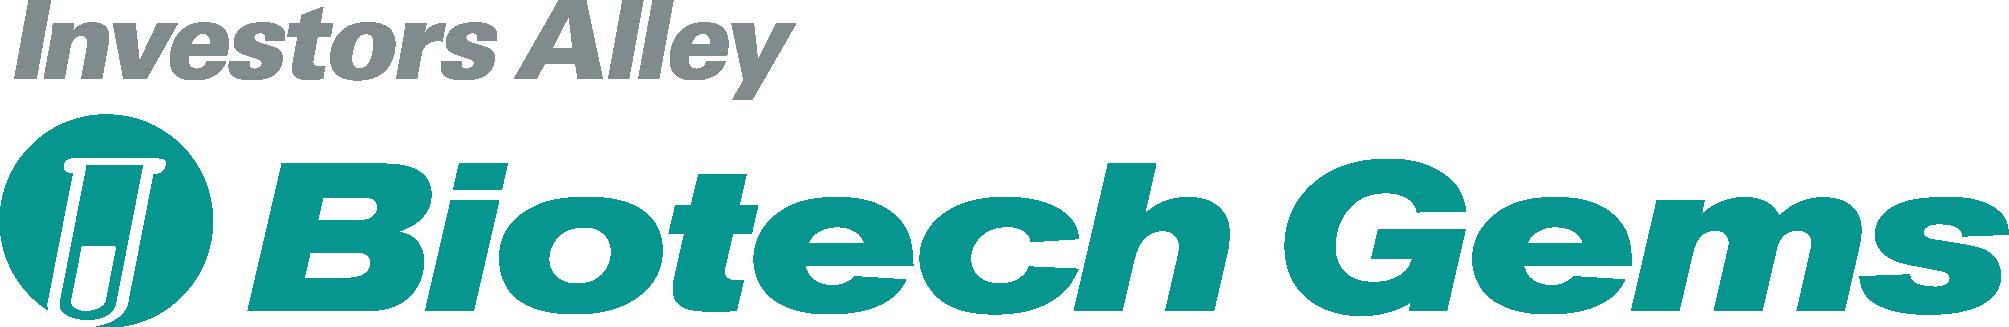 ia_biotechs